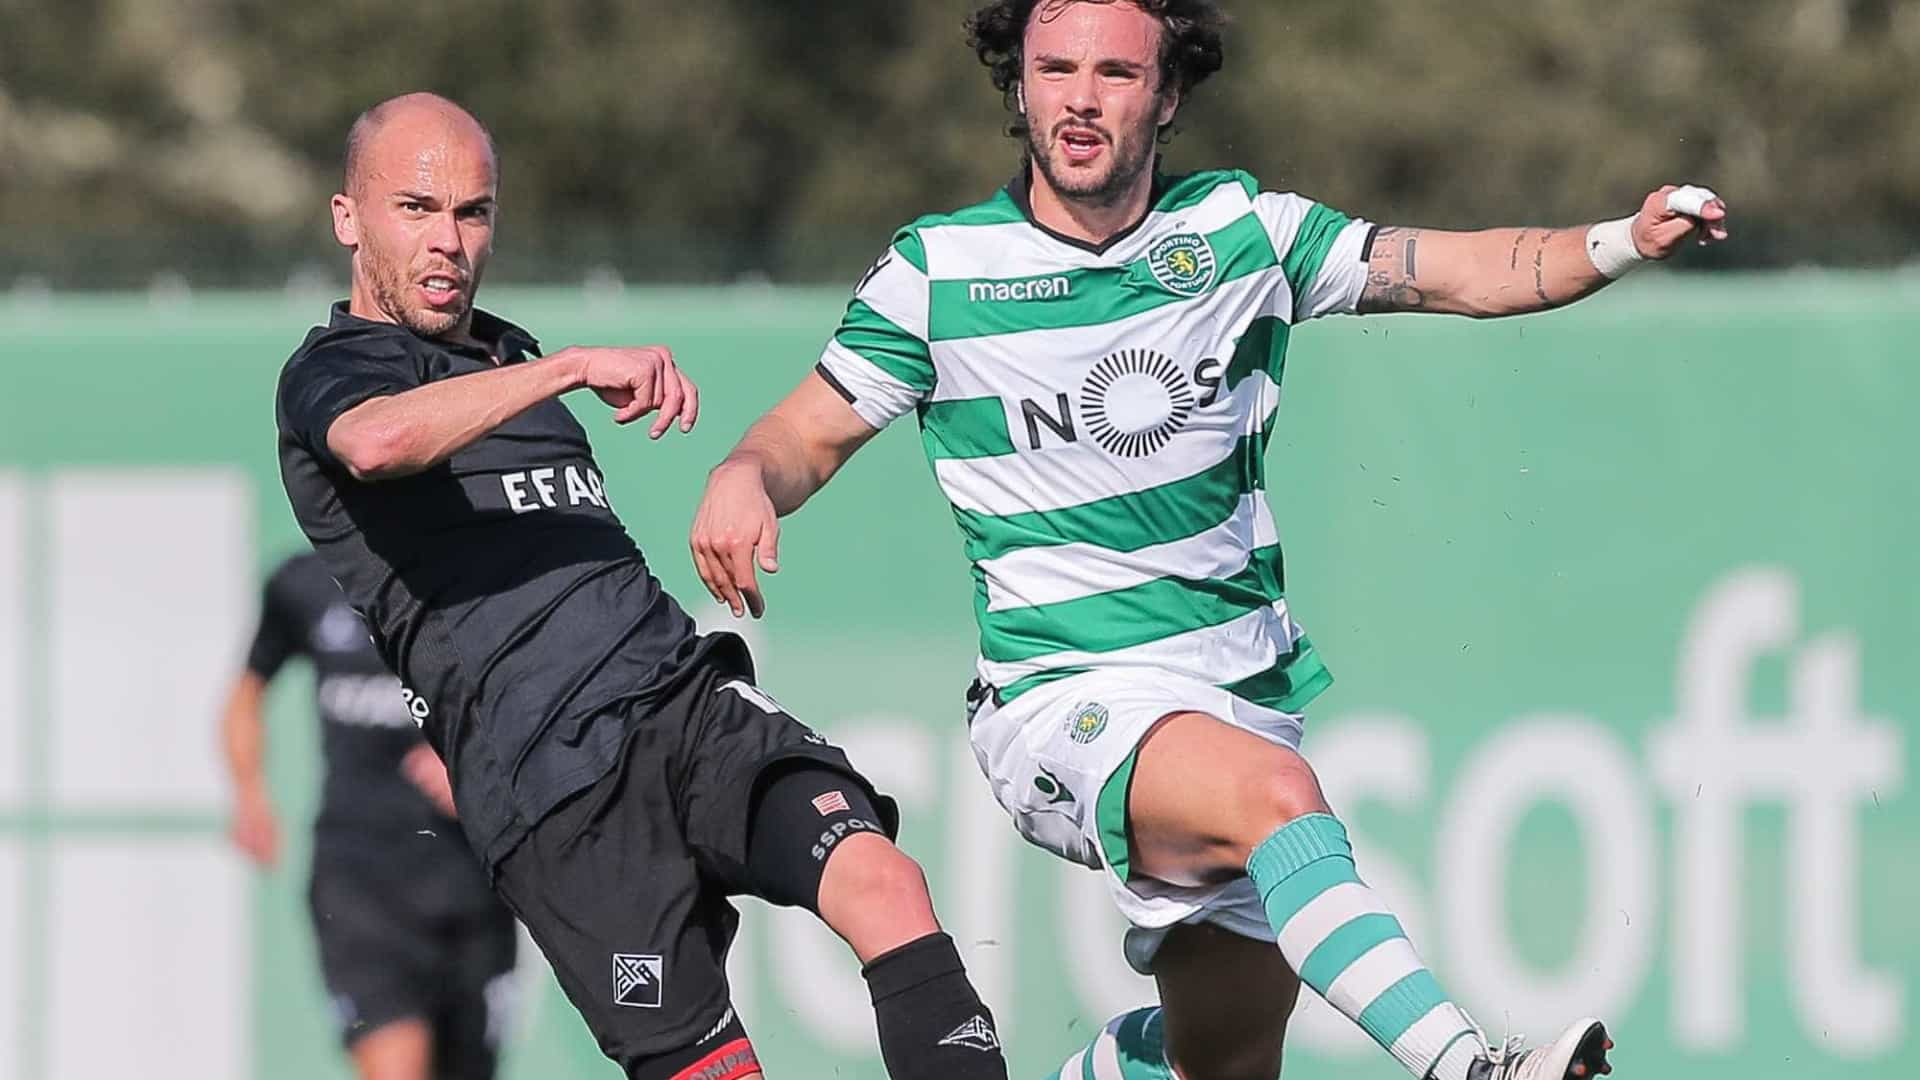 Sporting vai deixar de atuar na II Liga